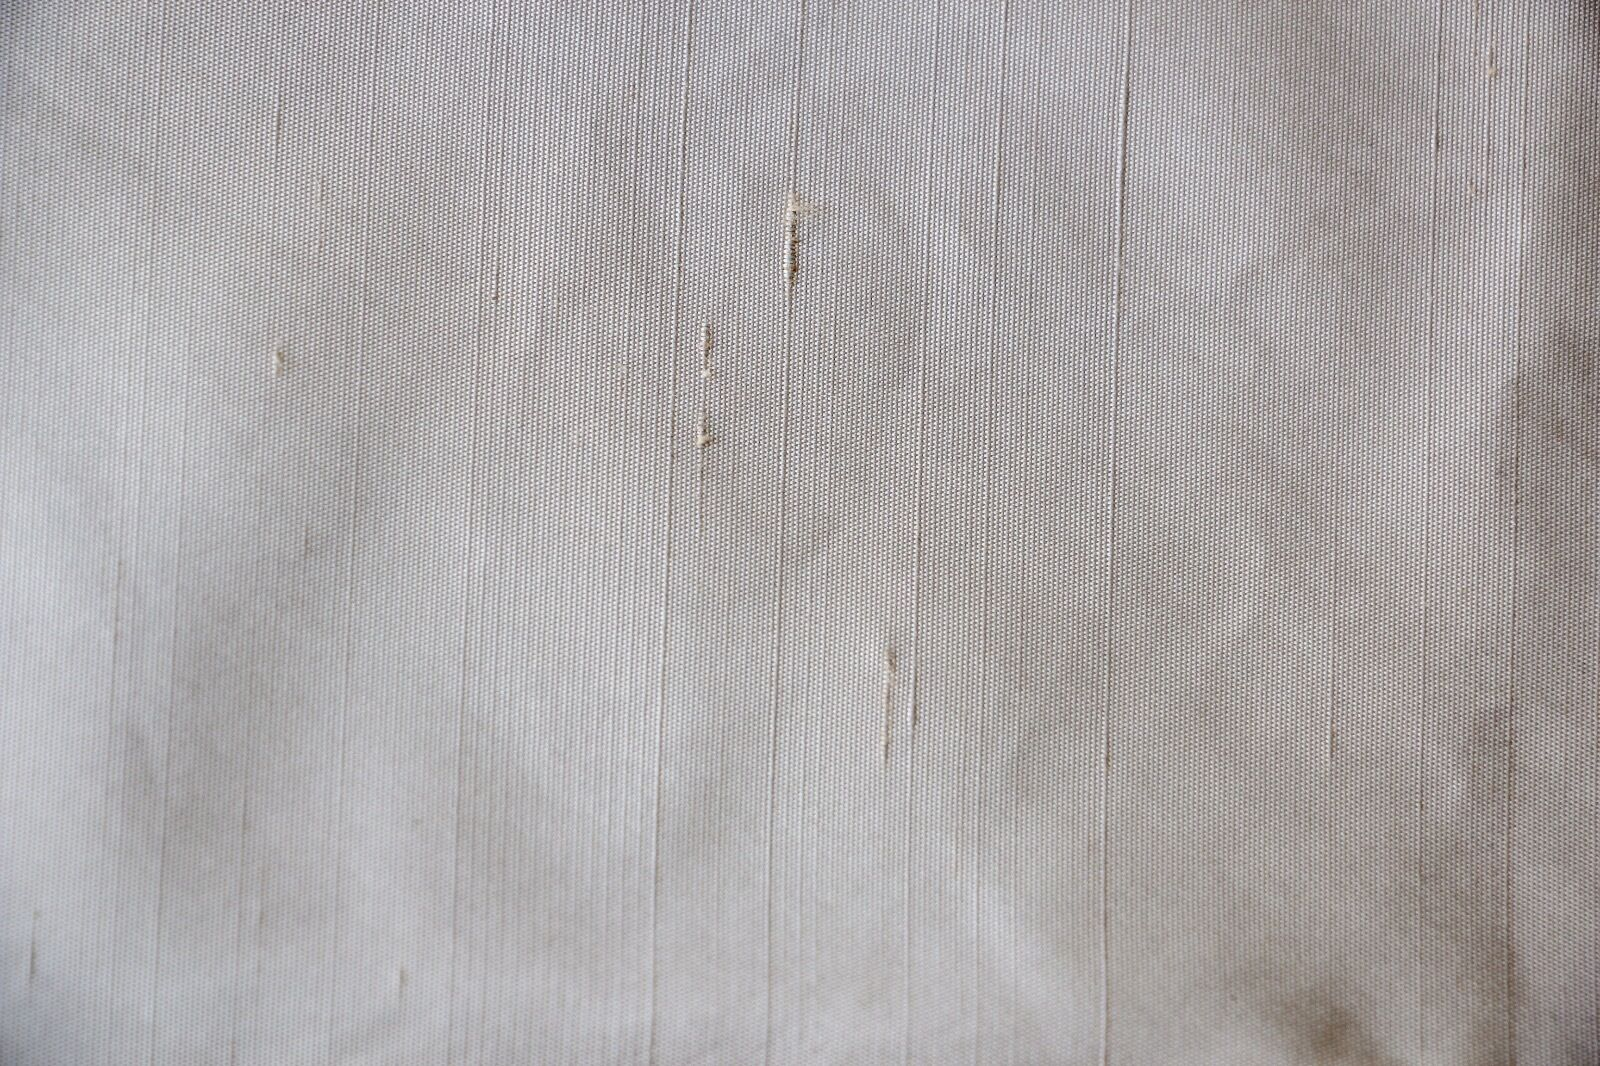 BNWT damen Max Mara Tunic Beige Silk Blend Collarot Tunic Mara Shirt 8 10  Safari S d3df7a